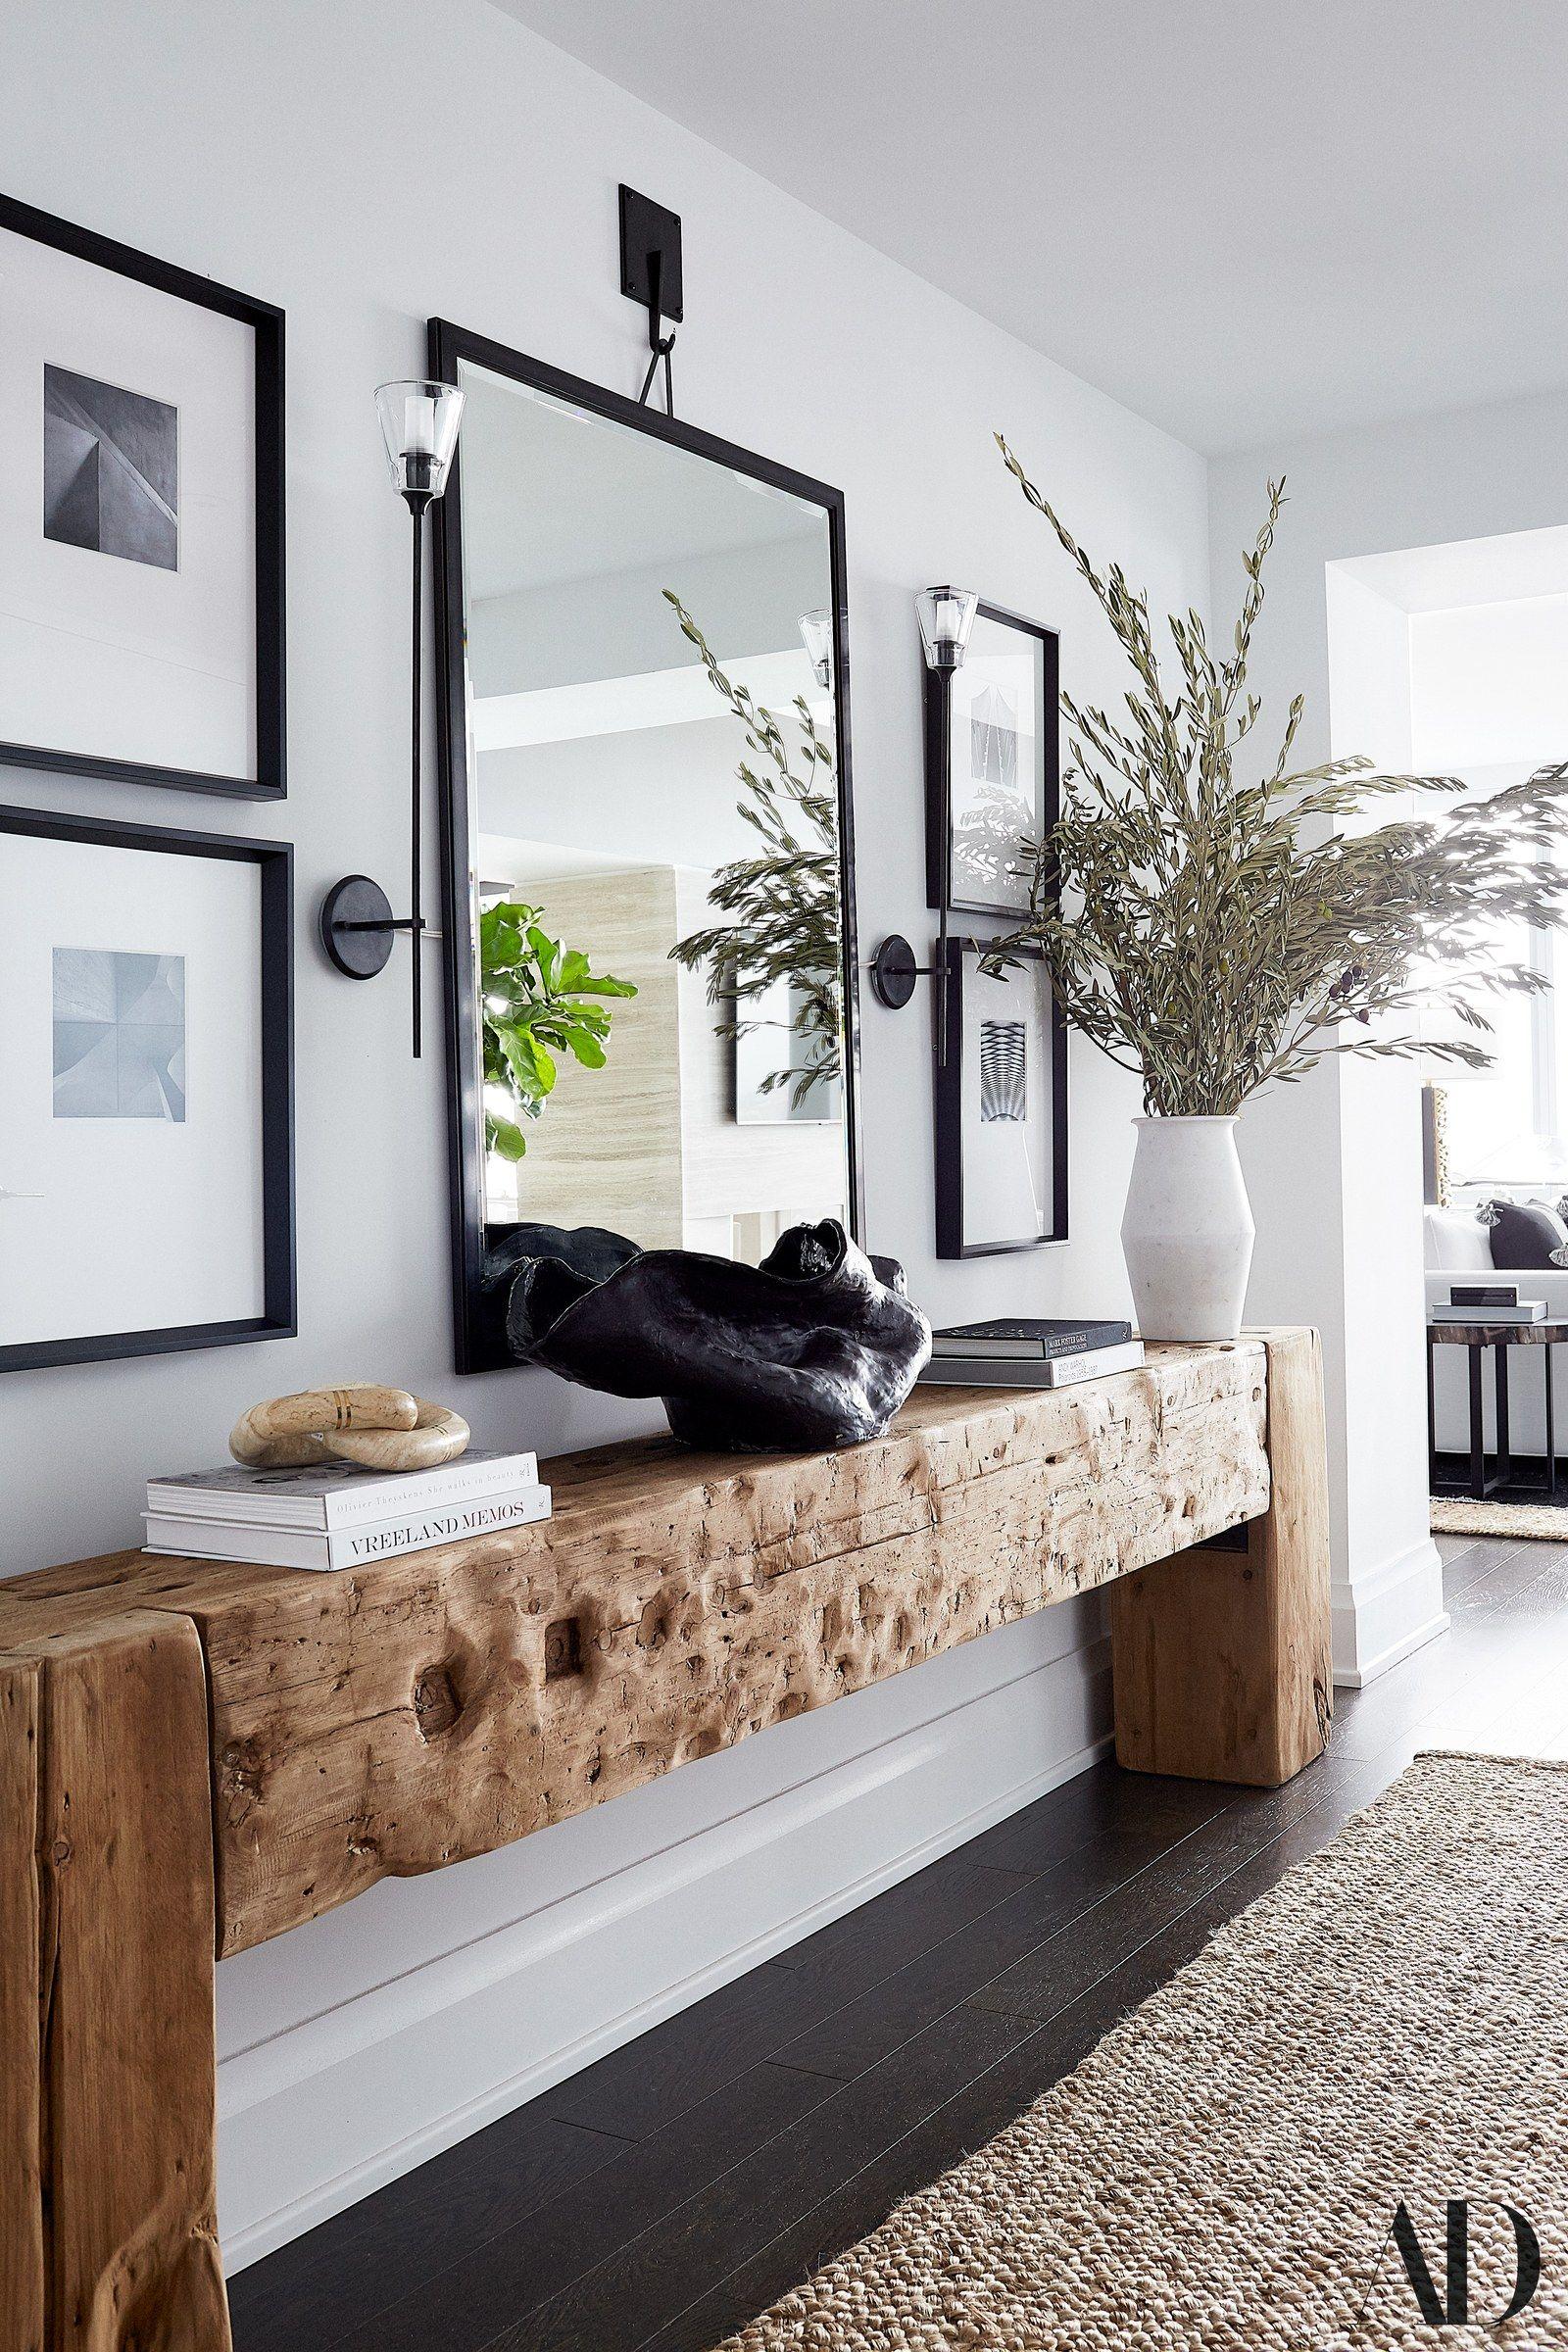 Kerry Washington Transforms a Bare Apartment Into a Cozy Family Home #hallway